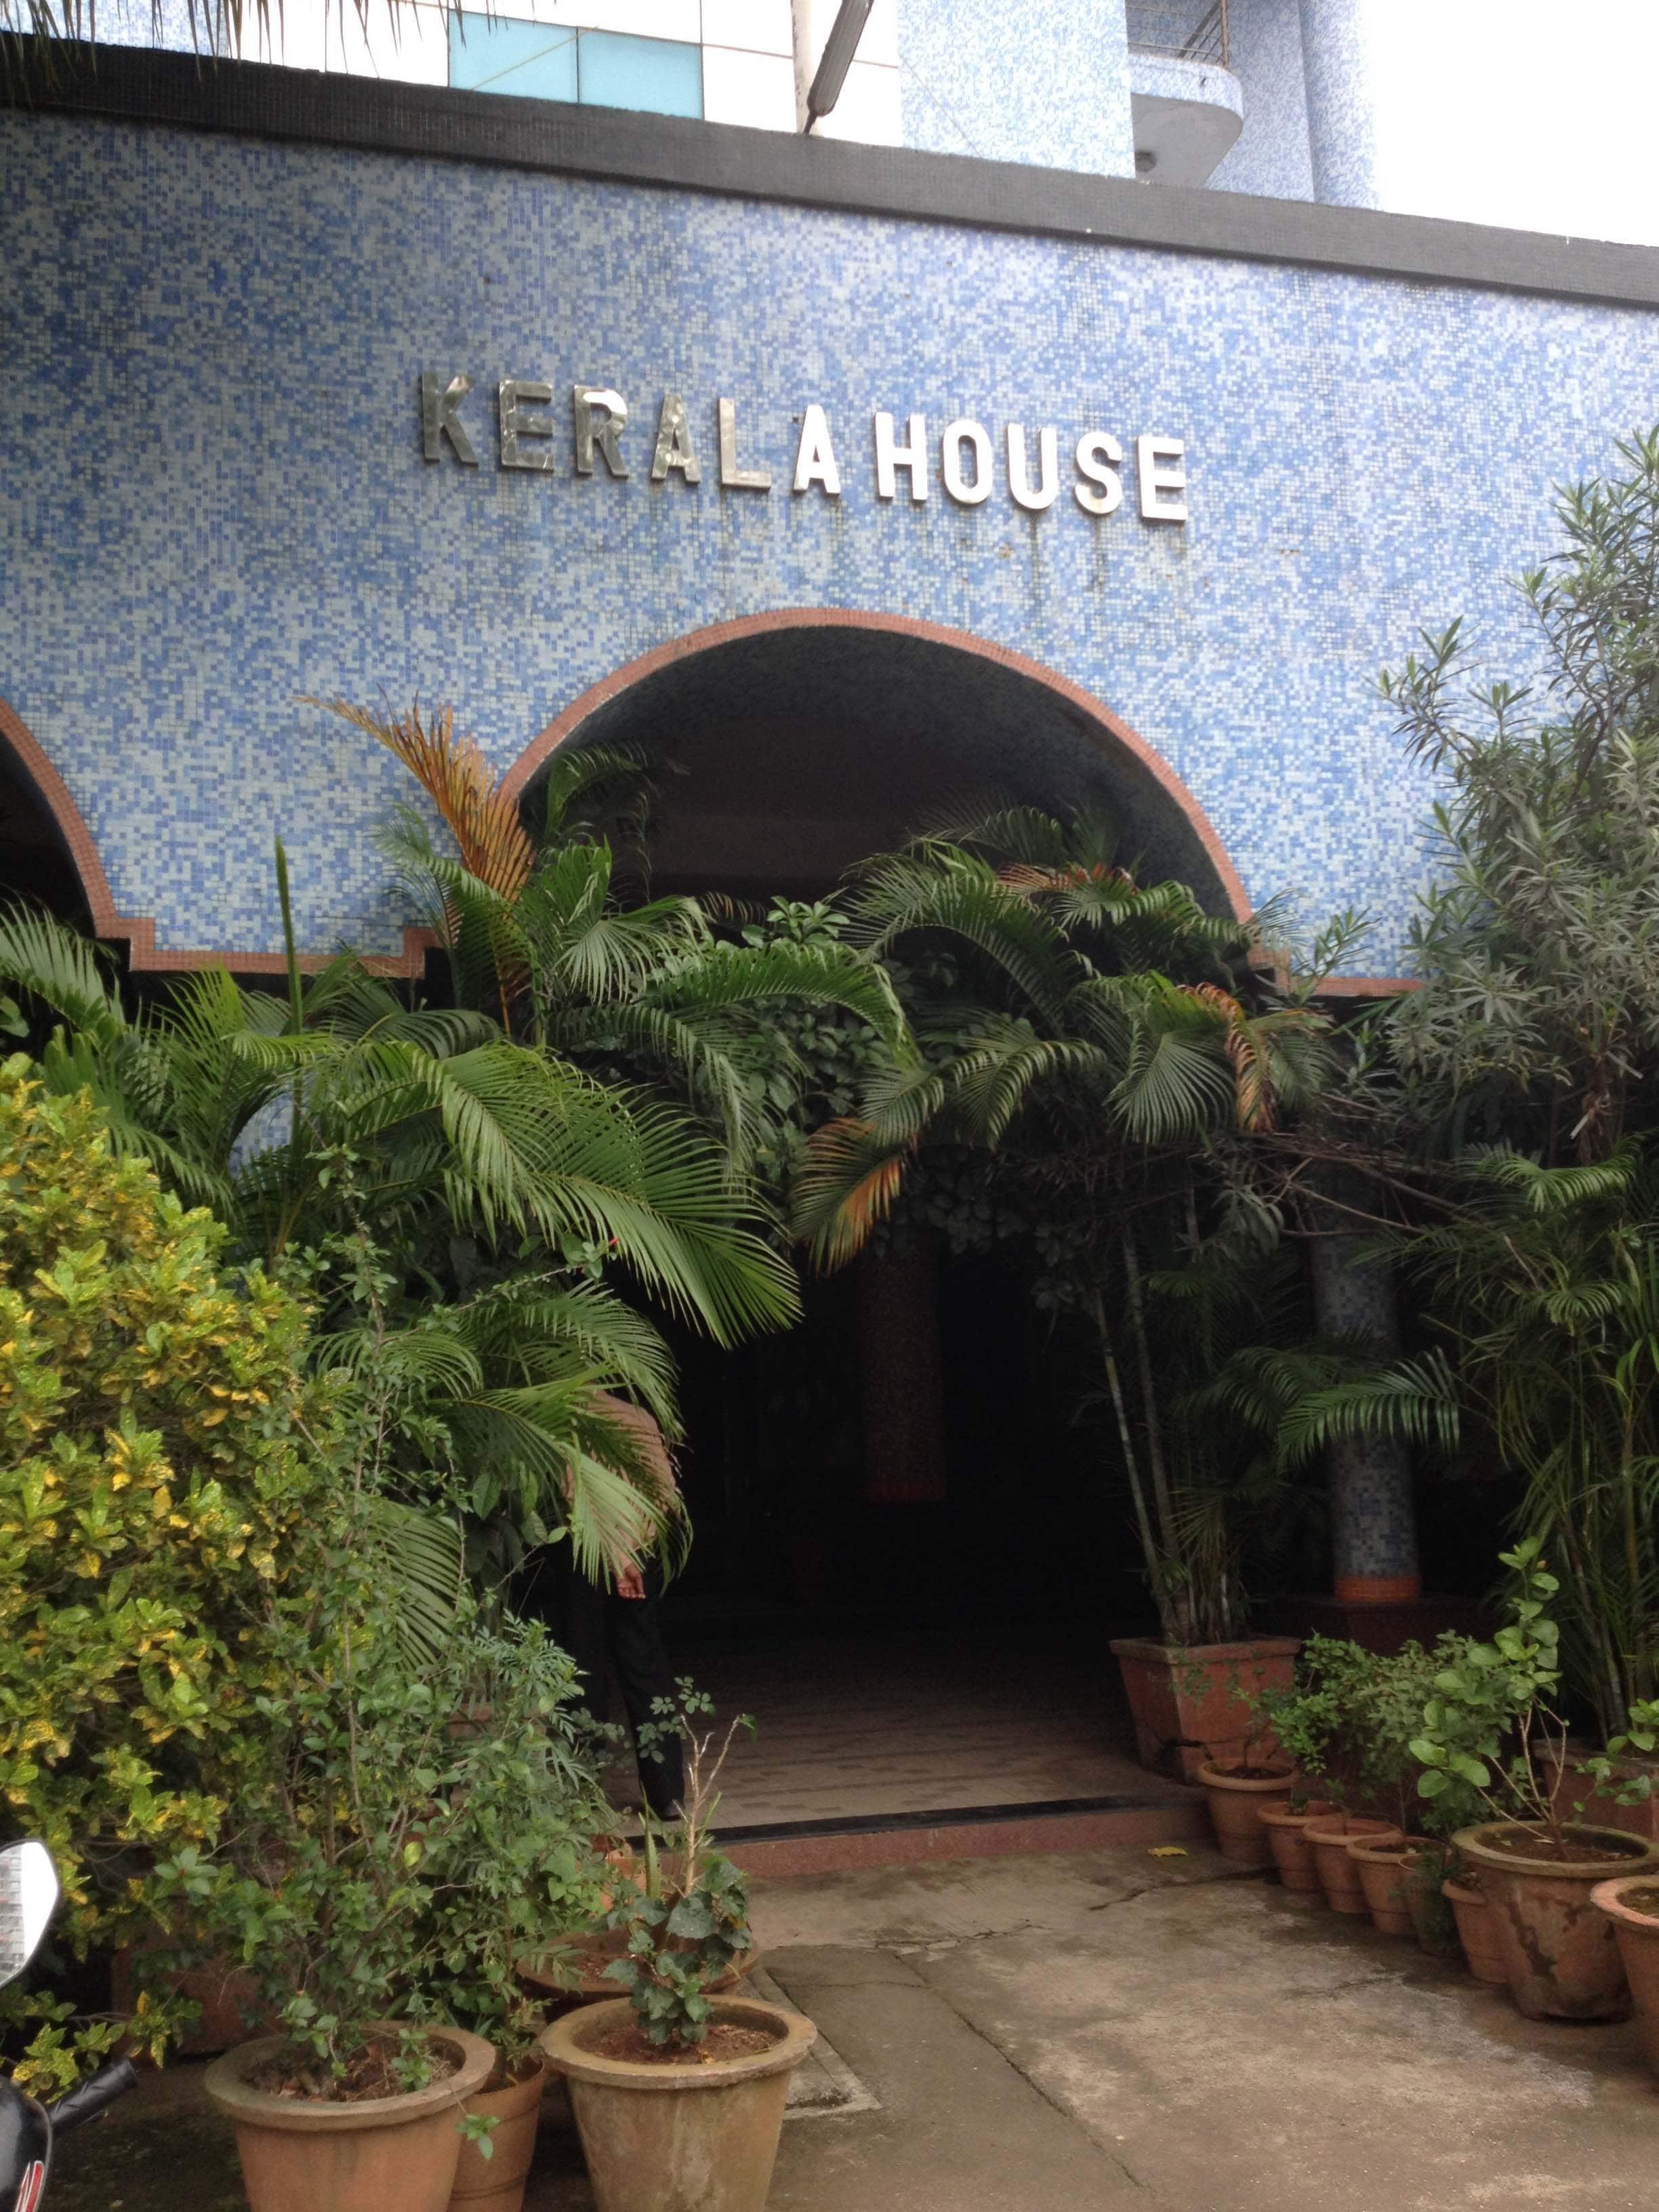 Kerala House - Vashi - Navi Mumbai Image